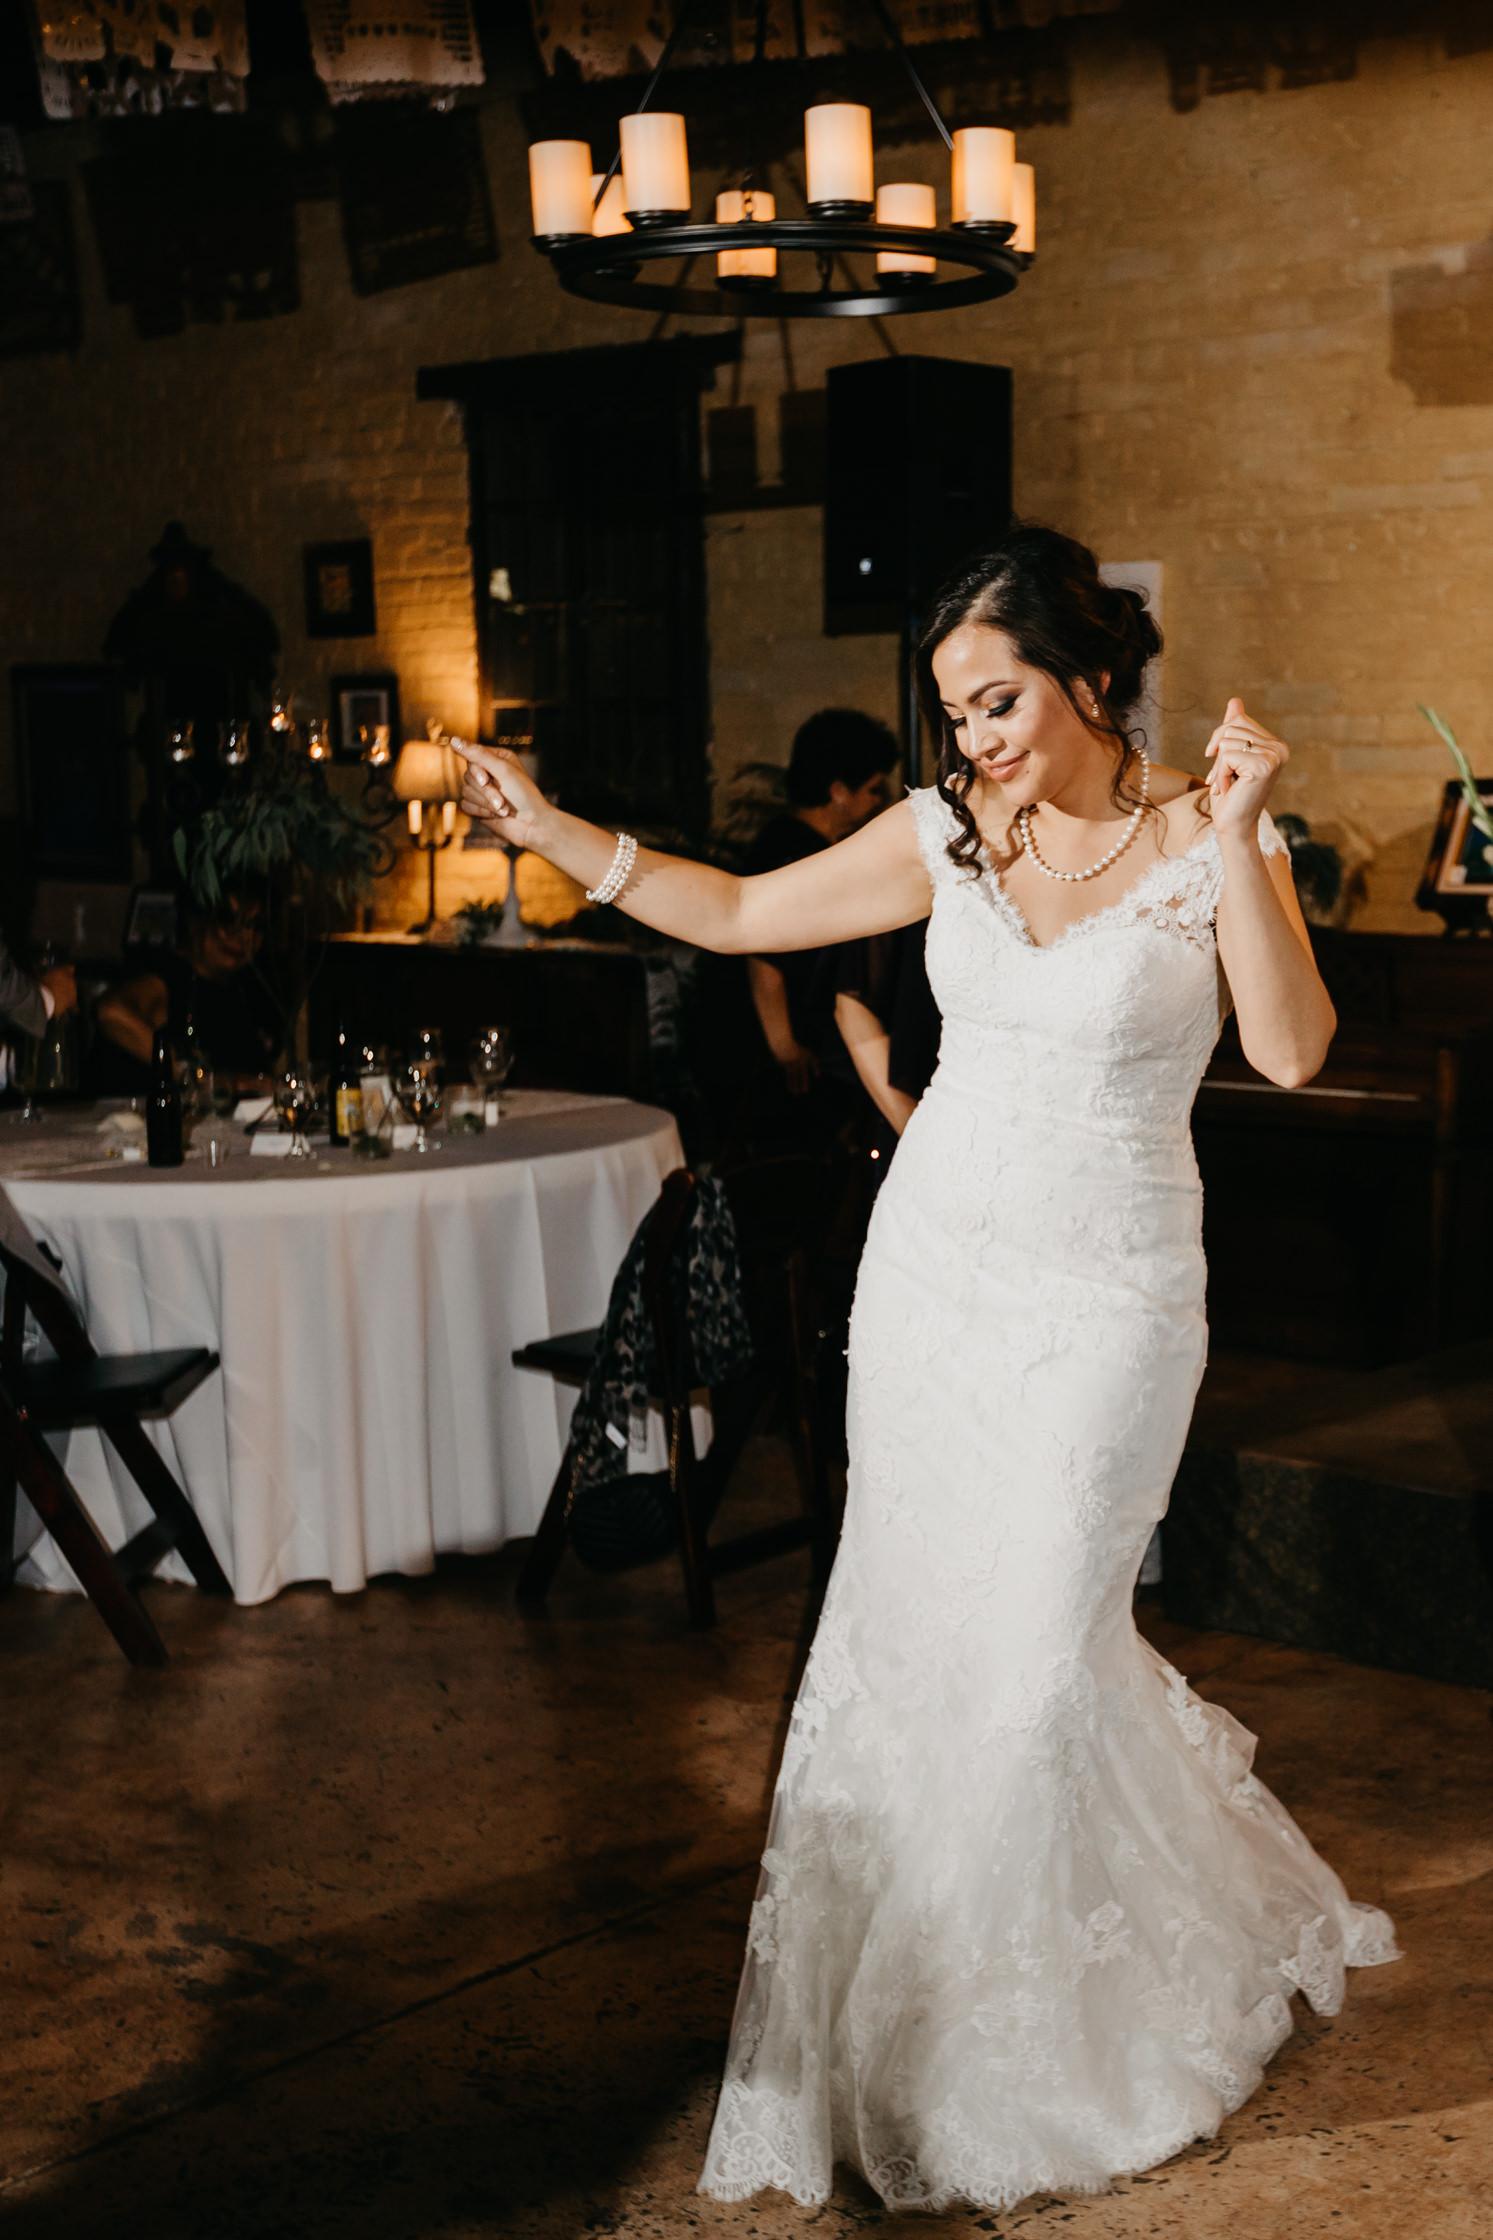 luis_joanna_wedding-107.jpg